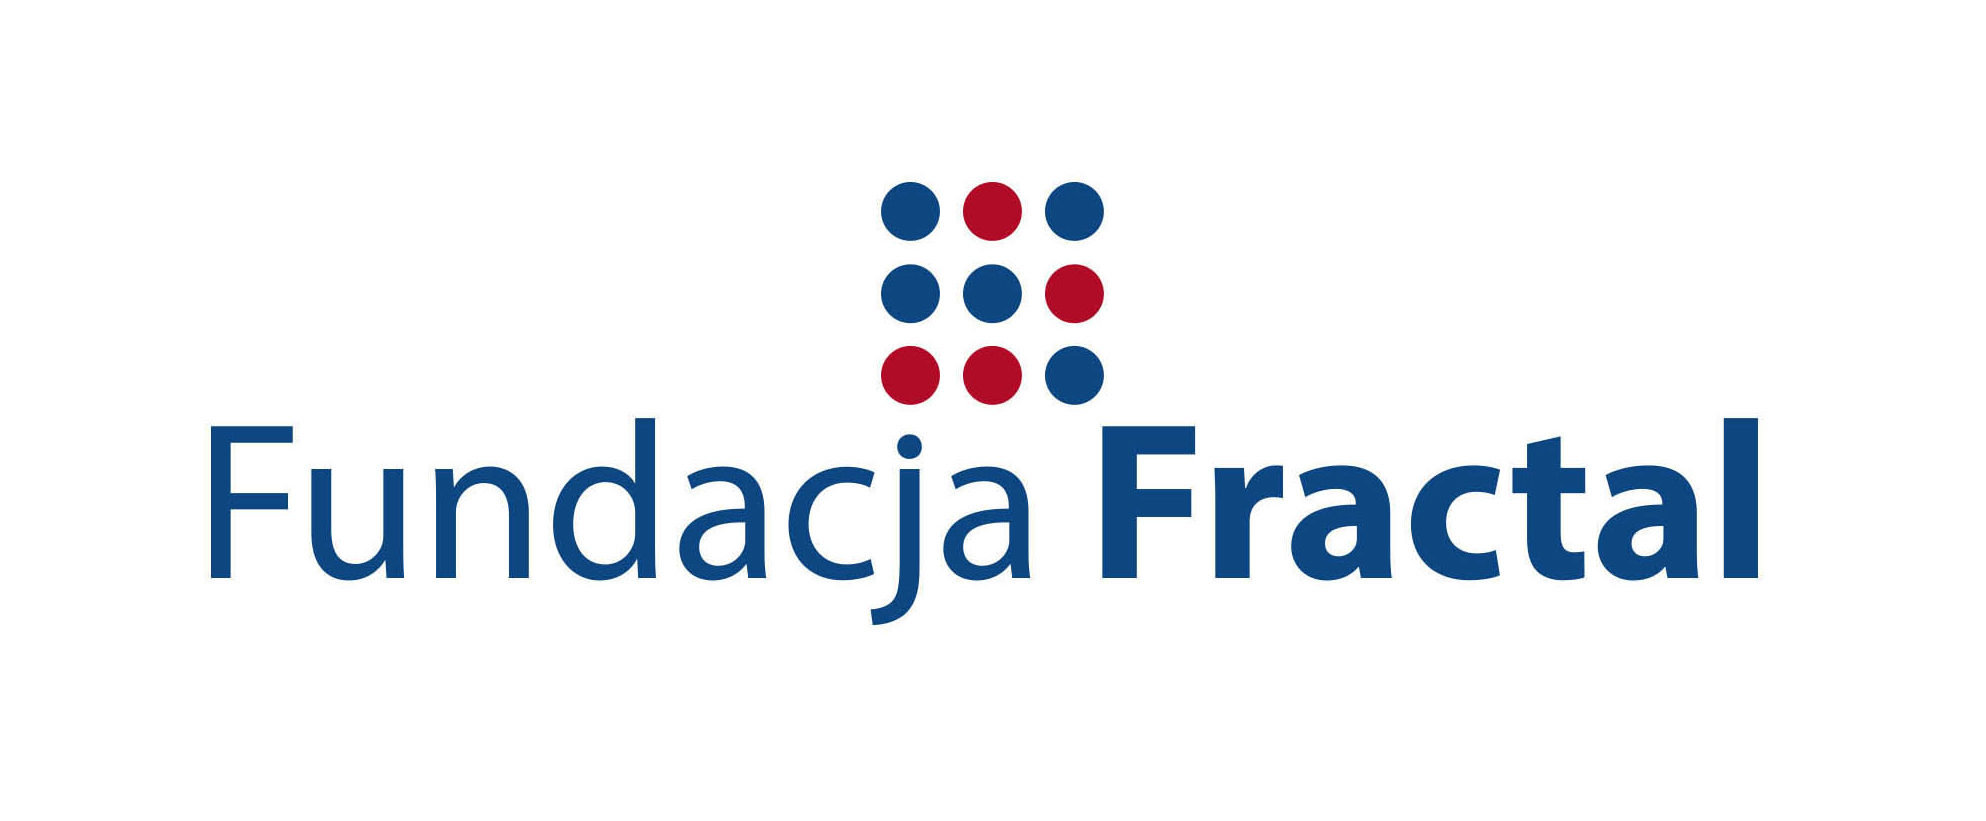 Fundacja Fractal